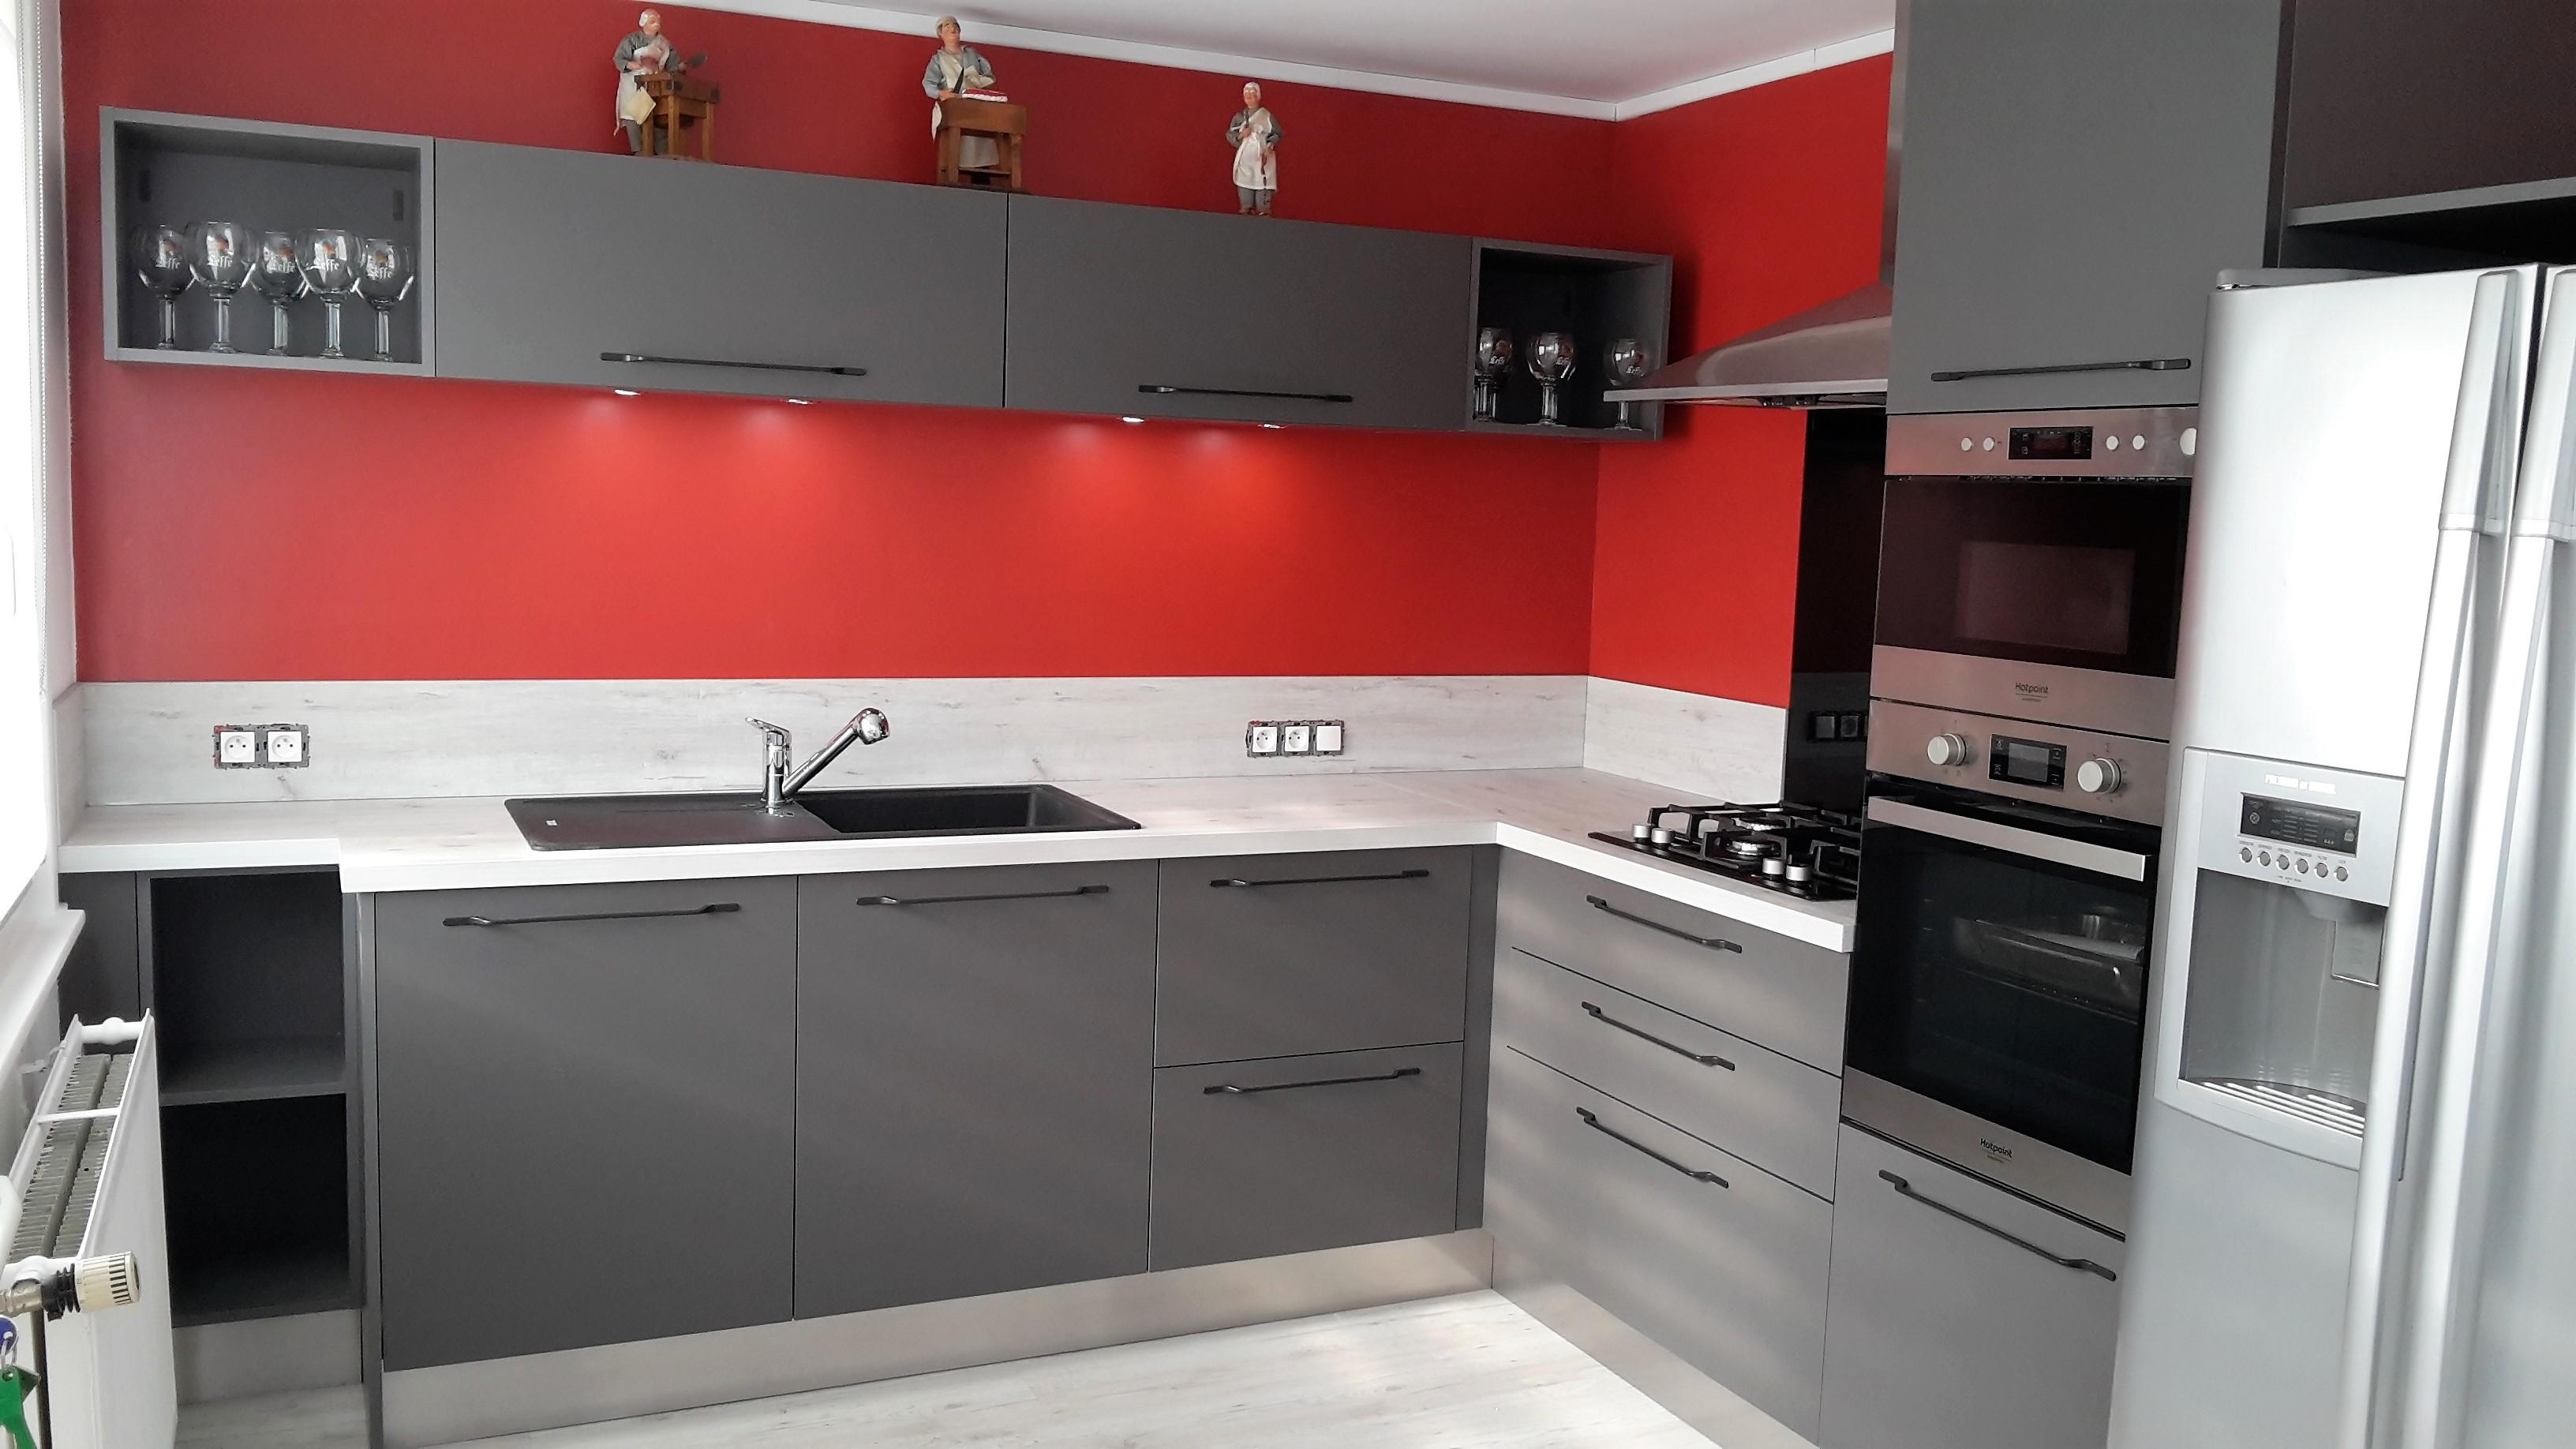 kubbe cuisiniste arras dainville archives kubbe cuisine arras. Black Bedroom Furniture Sets. Home Design Ideas